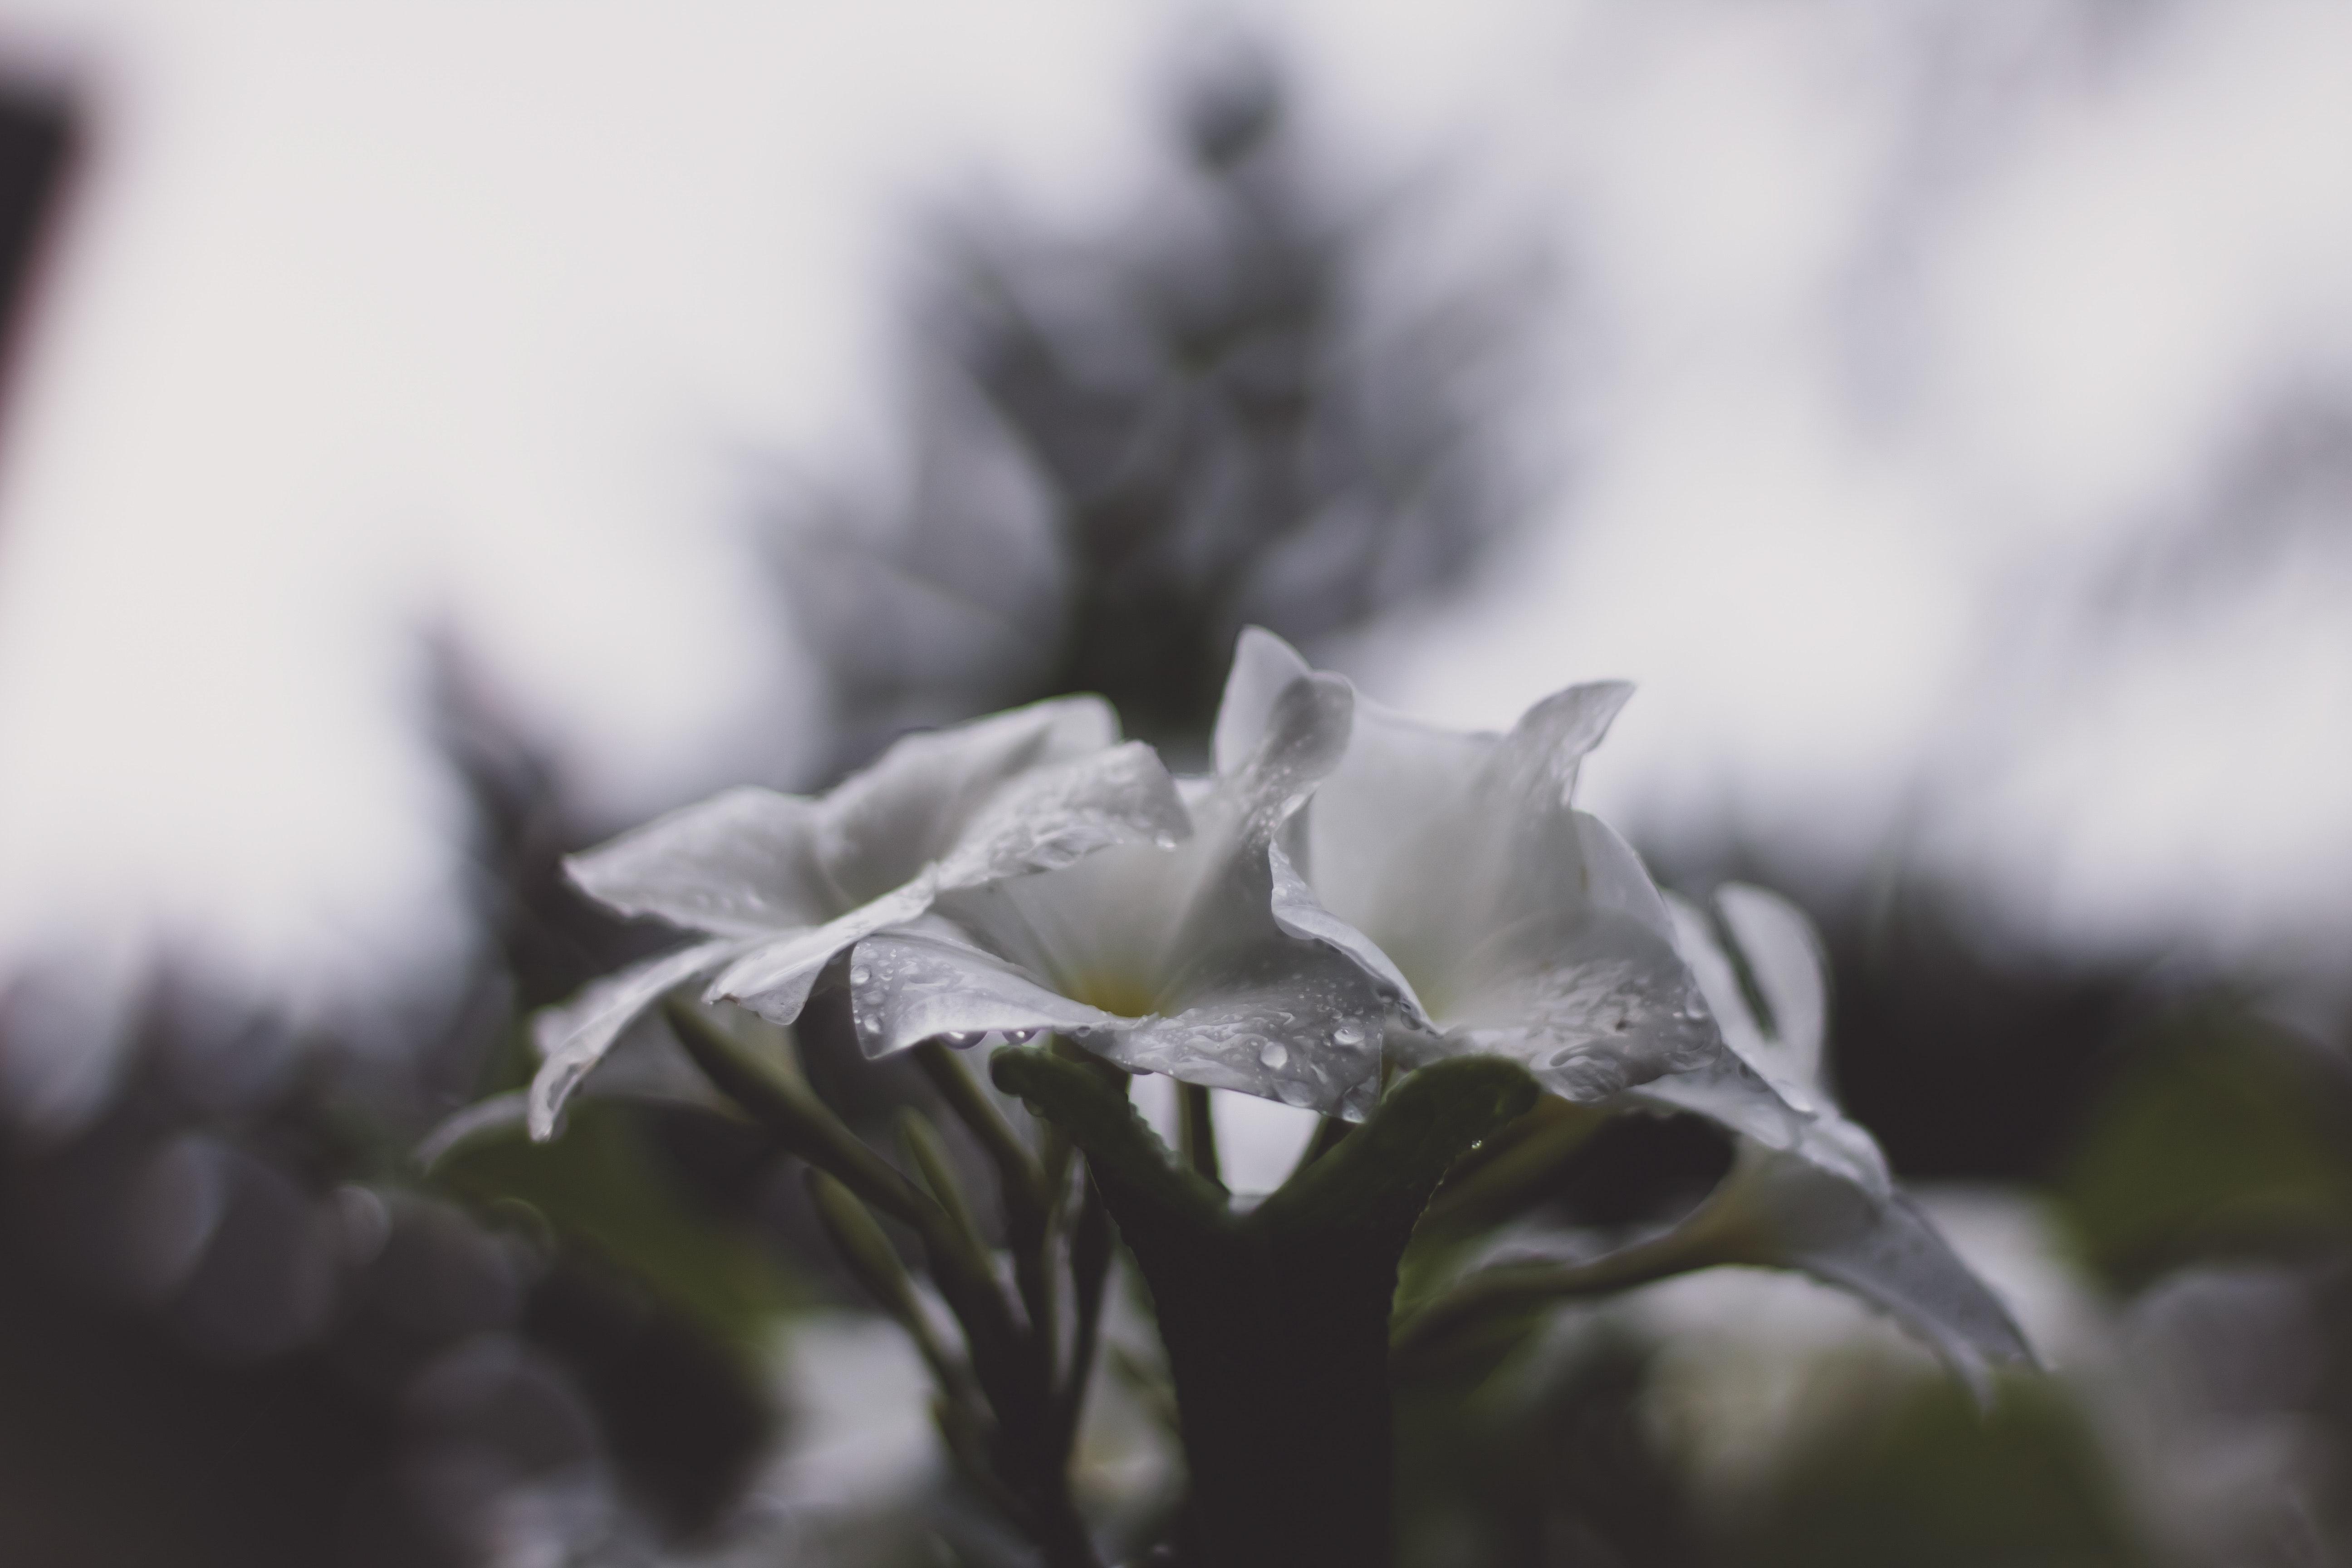 Gambar Bunga Bunga Indah Berkembang Berbunga Mekar Terang